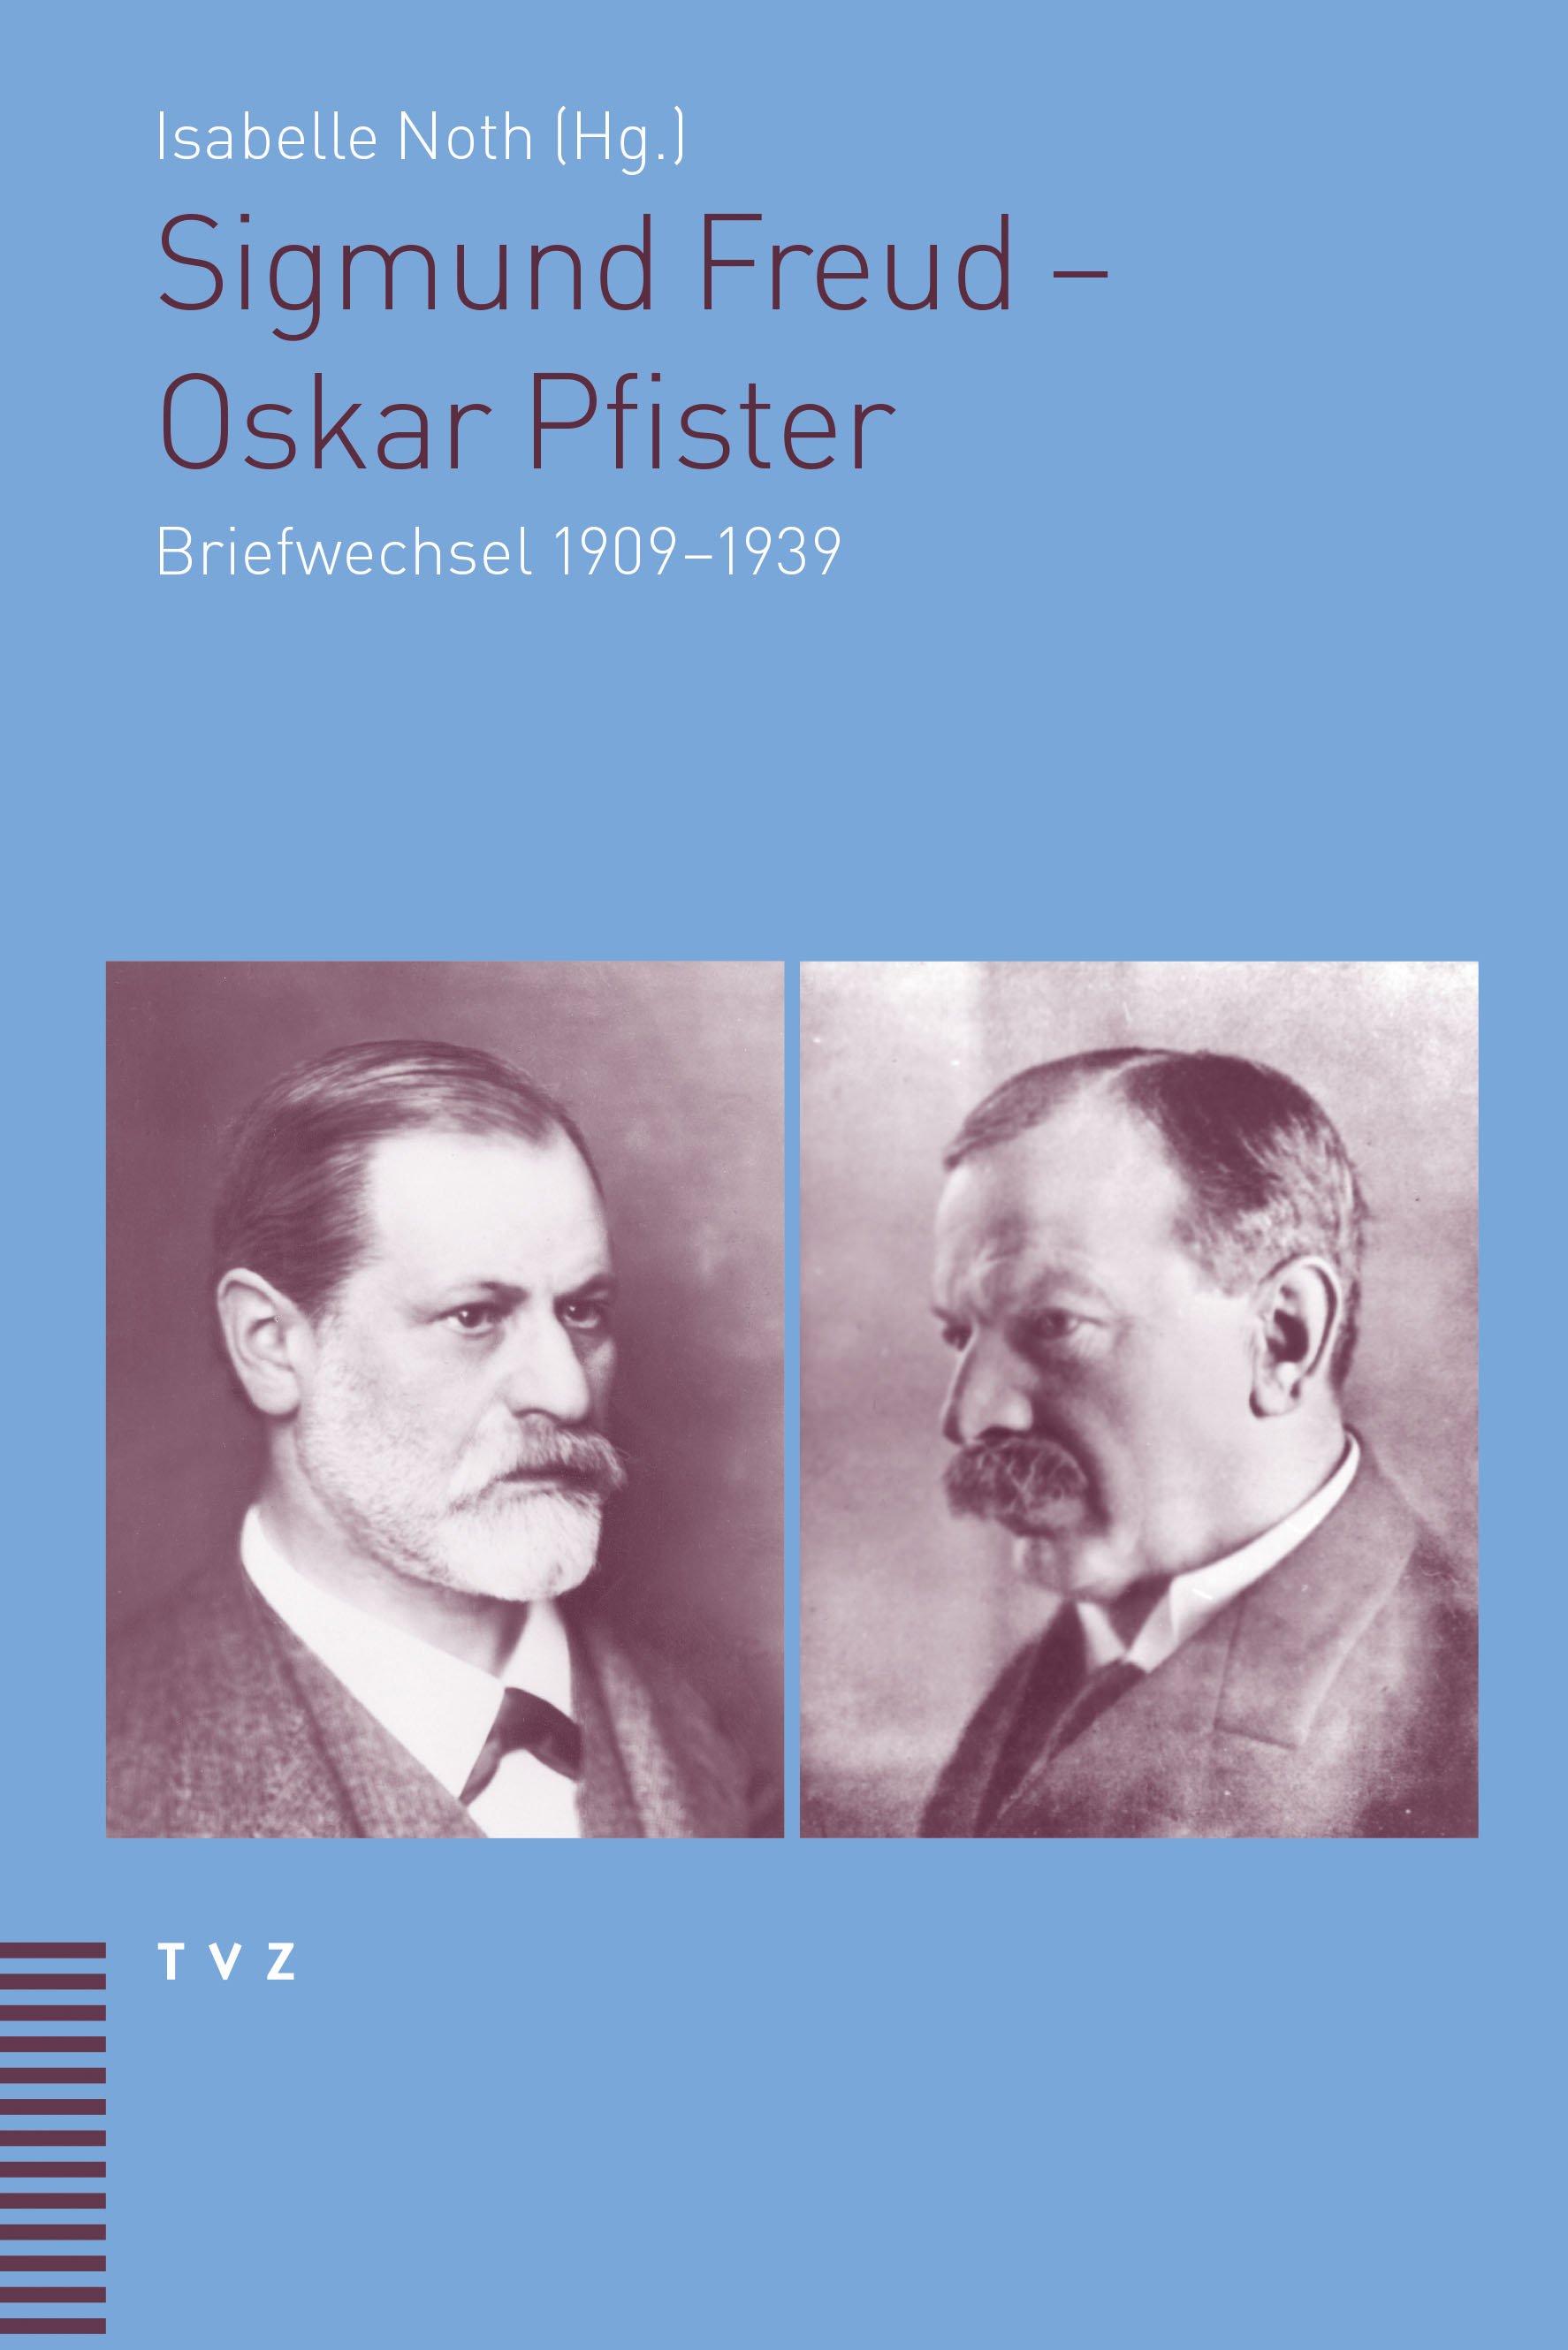 Sigmund Freud – Oskar Pfister